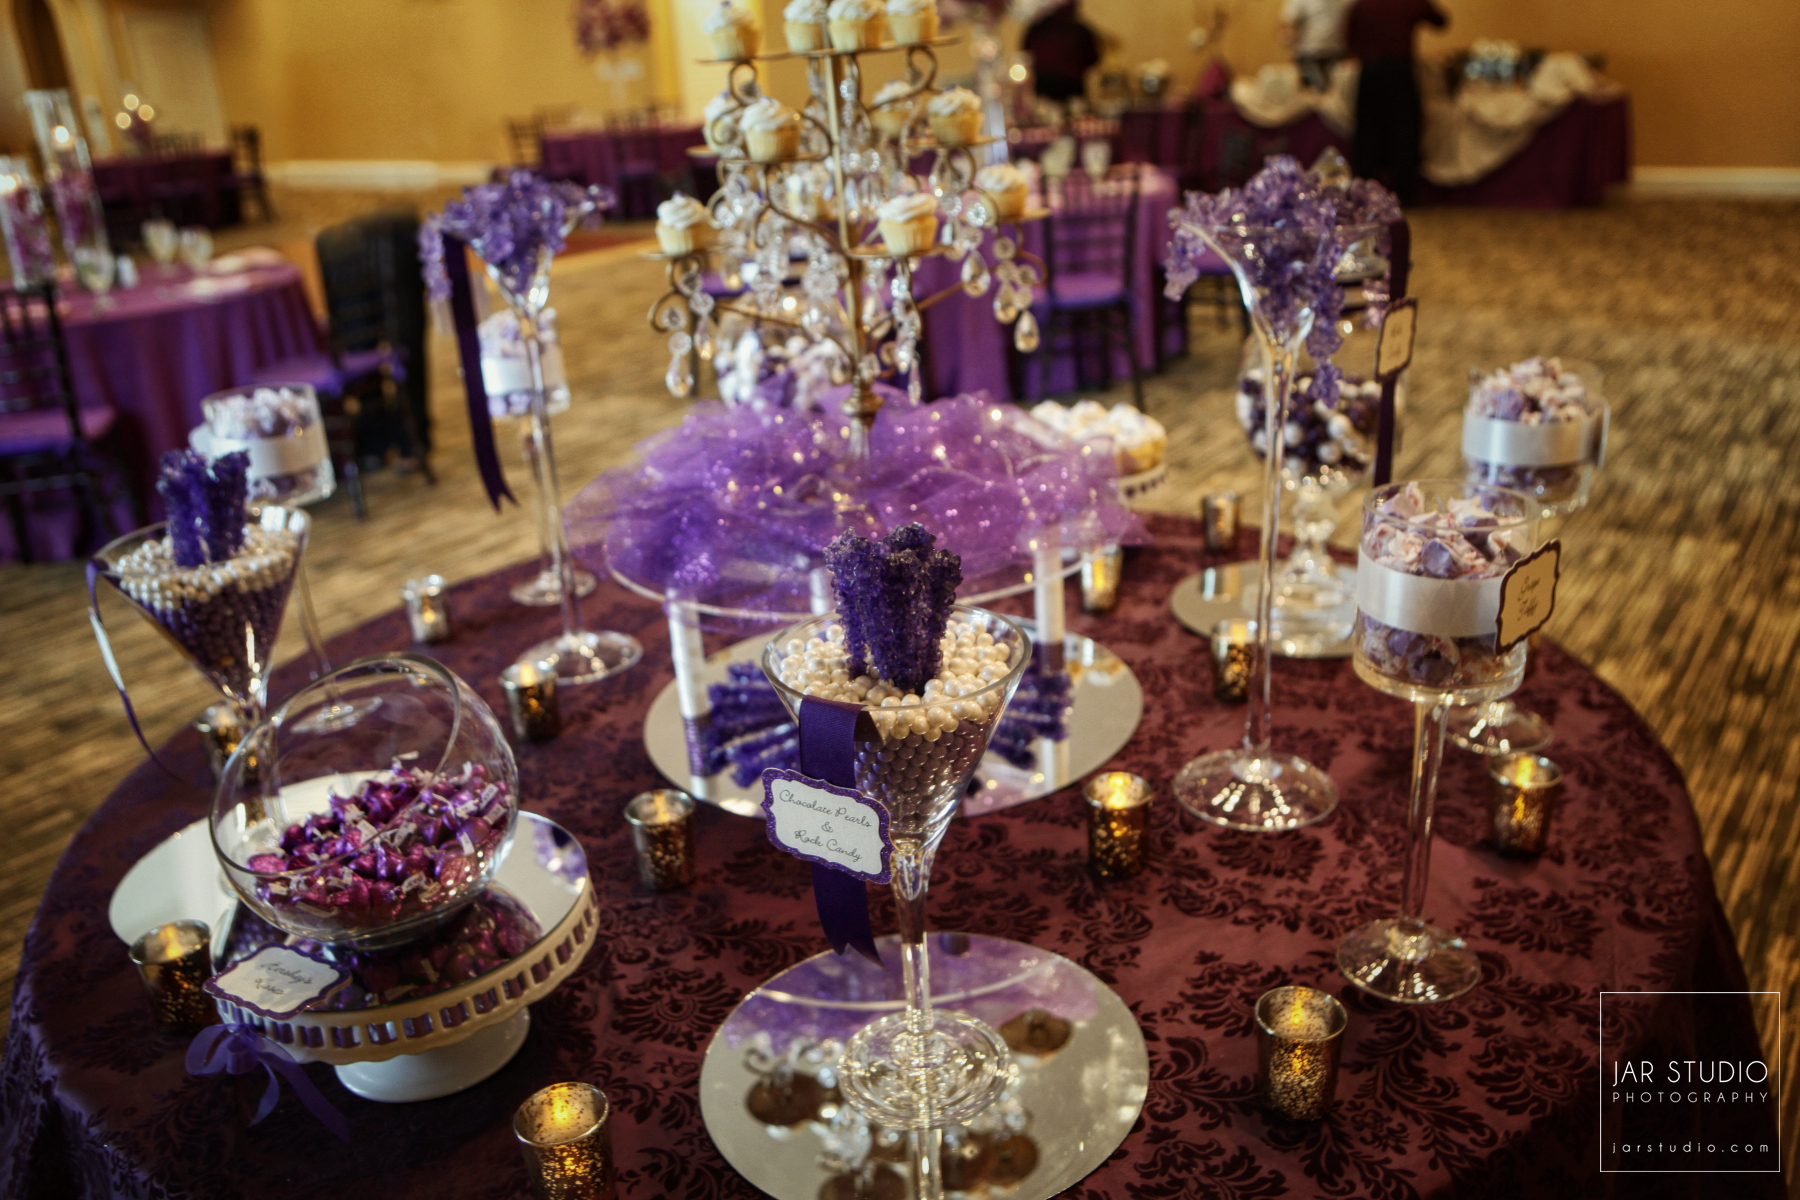 31-Hilton-tuscany-event-reception-decor-room-elegant-jarstudio-orlando-photographer.JPG